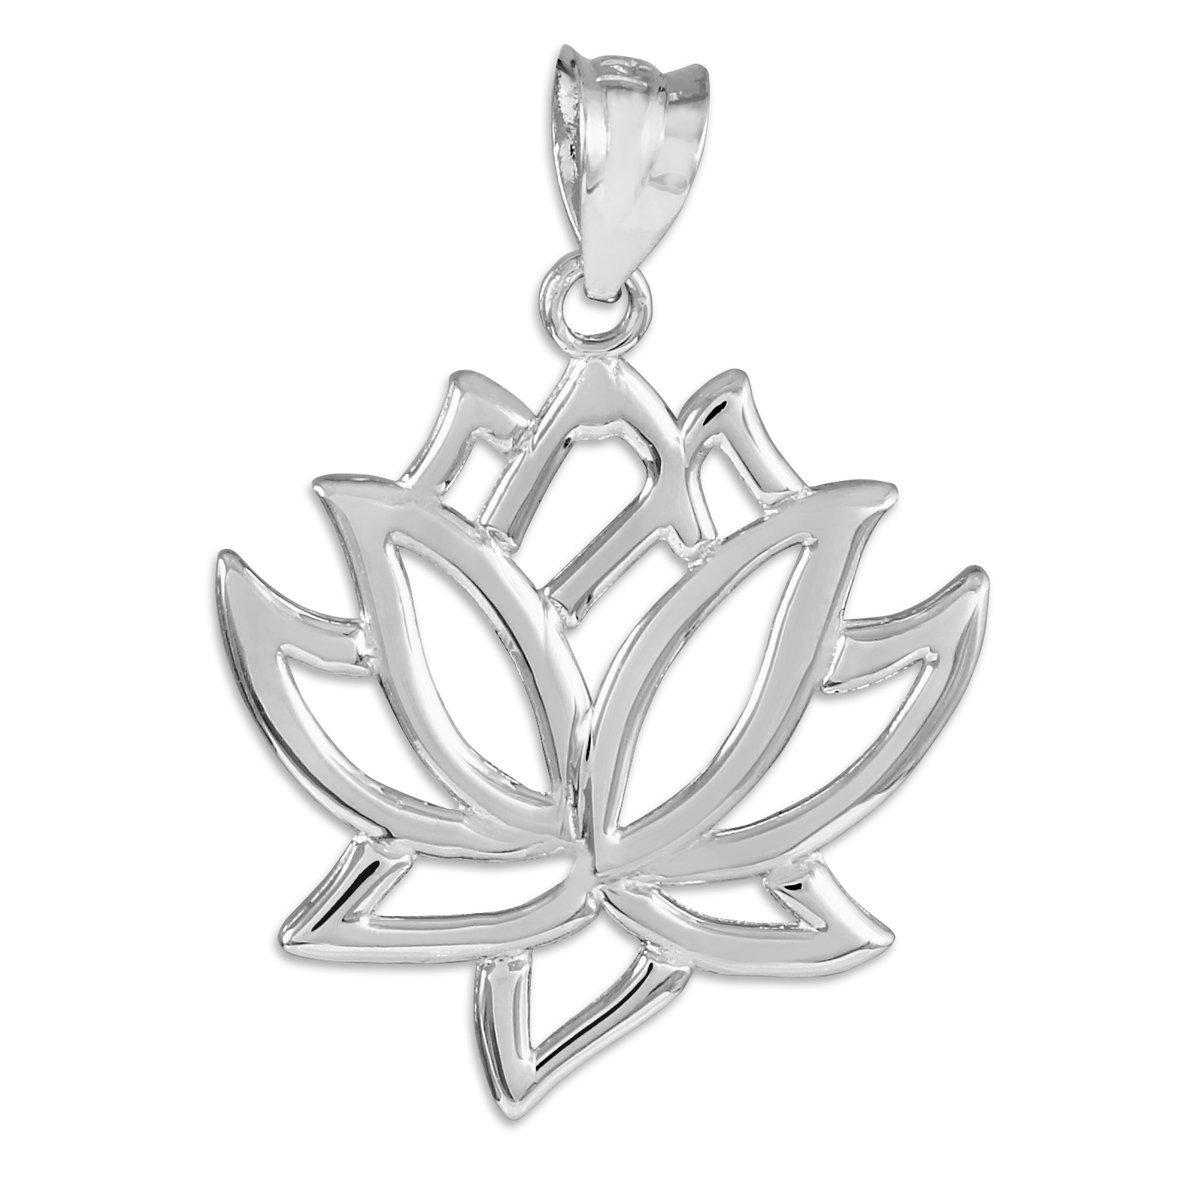 Amazon 925 Sterling Silver Lotus Flower Pendant Yoga Jewelry